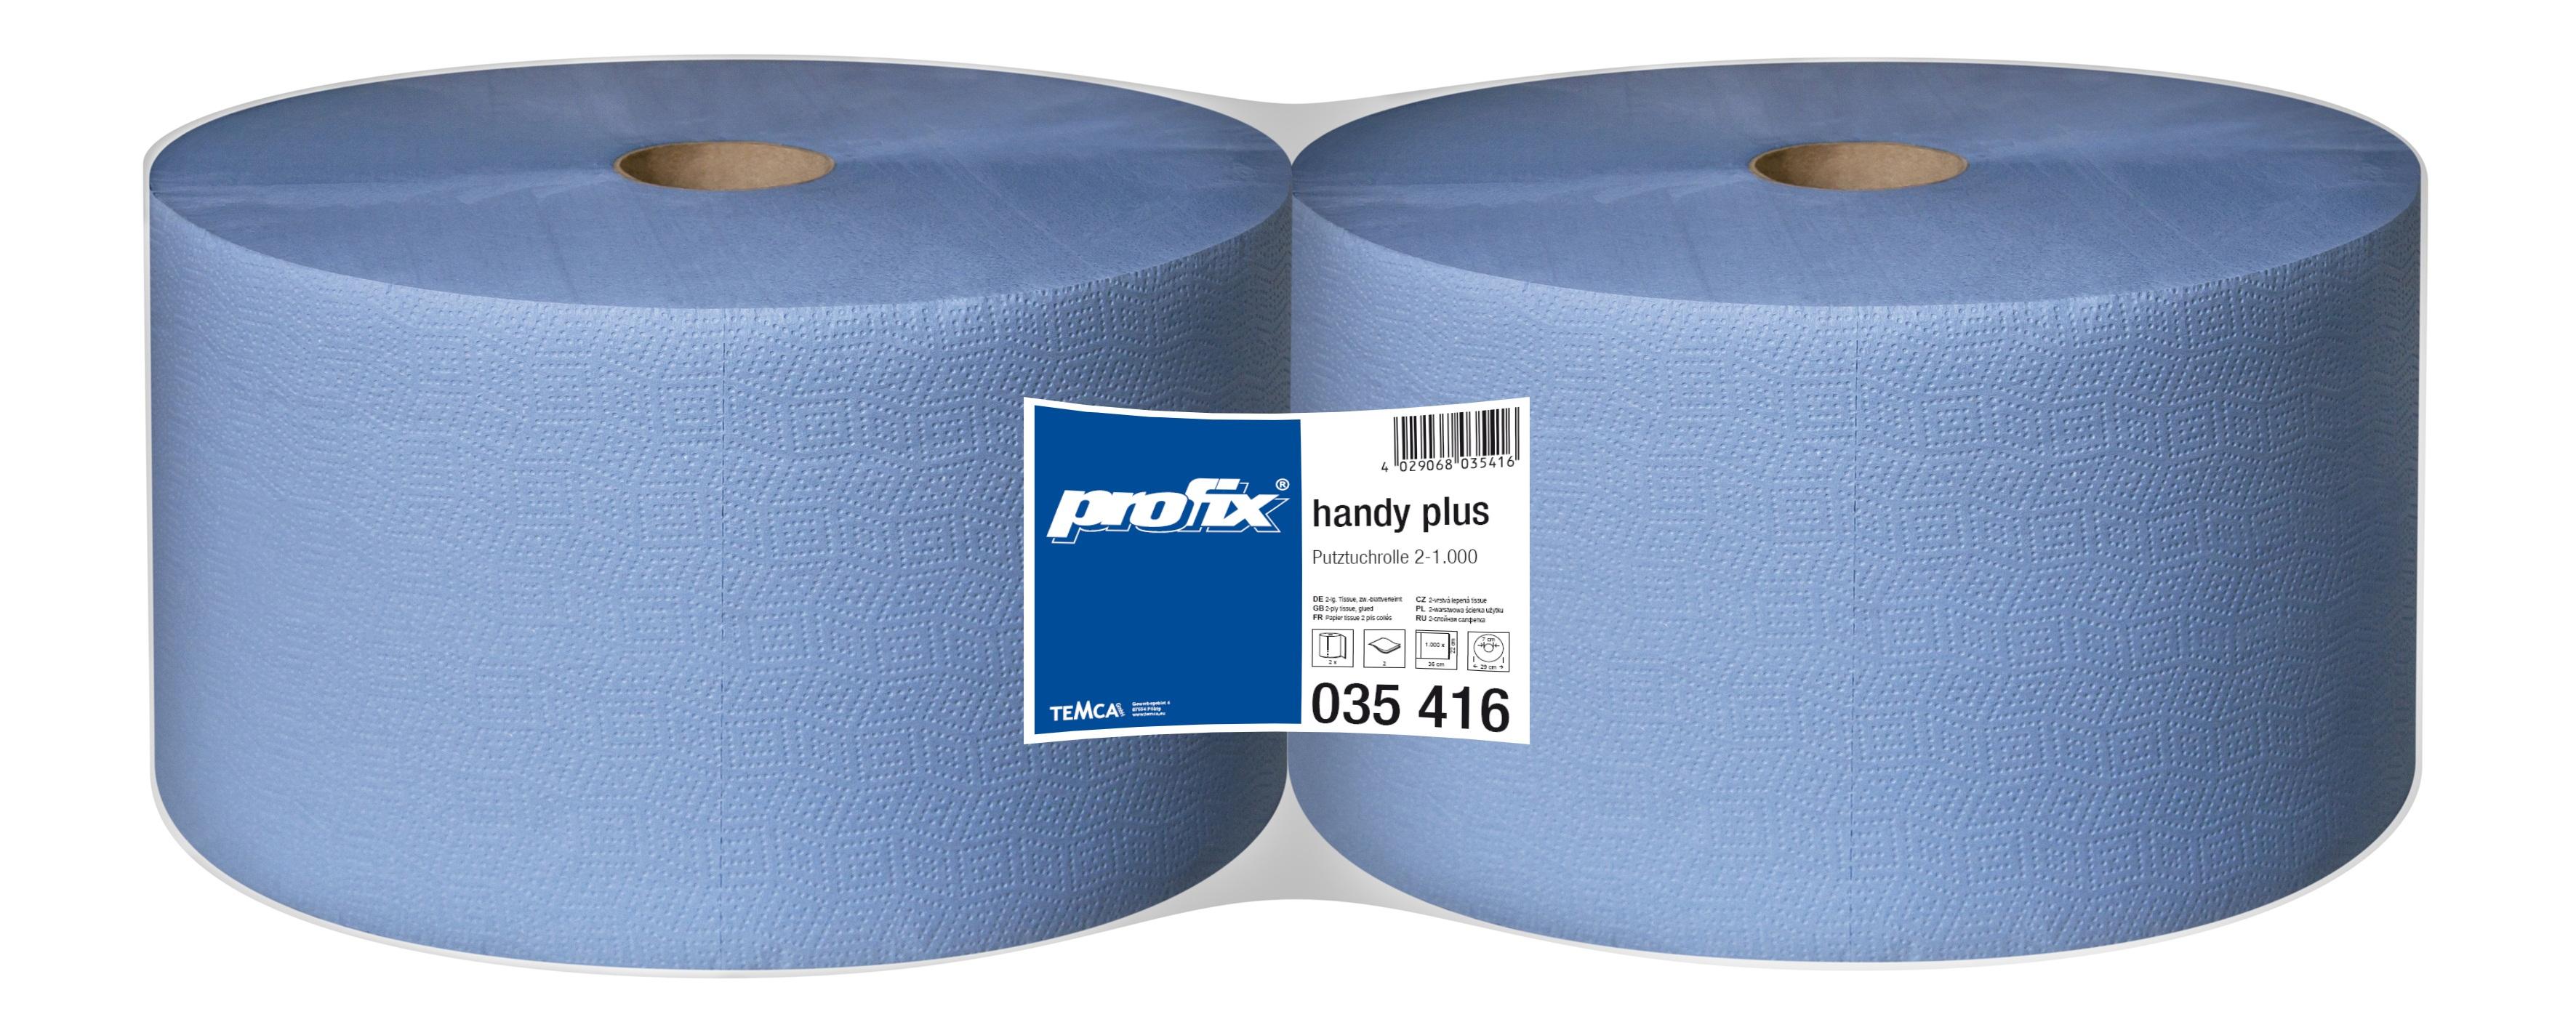 Papírové utěrky v roli Temca T035416, 2-vrstvé, 22x36 cm